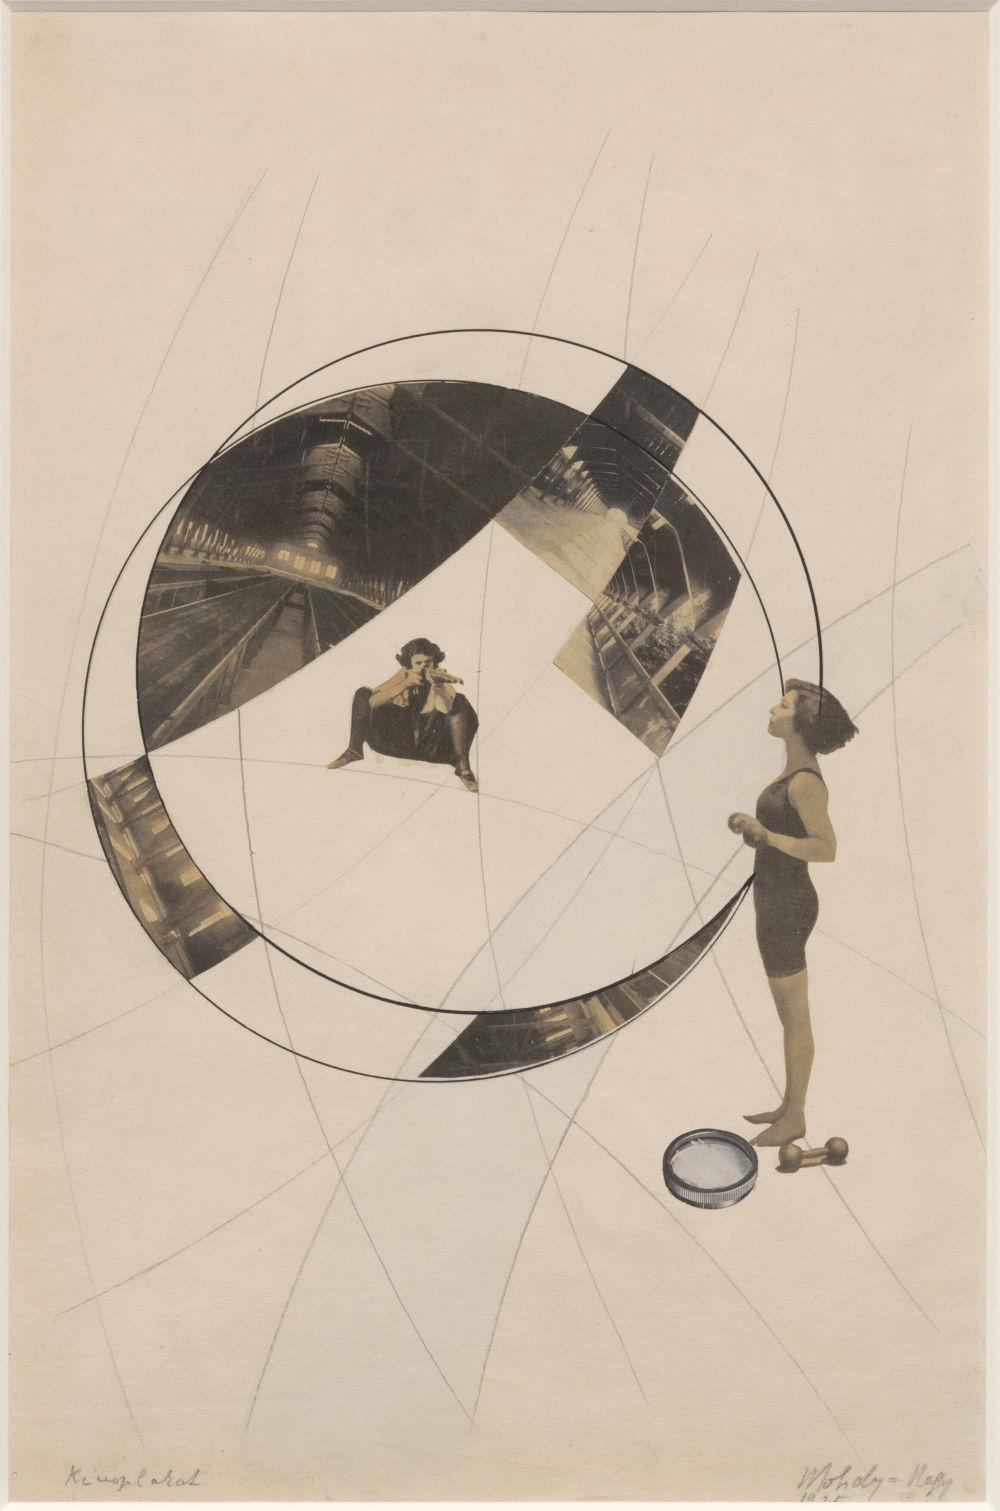 László Moholy-Nagy, Liebe deinen Nächsten / Mord auf den Schienen, 1925-1929. Collage 46.8 x 29.8 cm / 18 3/8 x 11 3/4 in © the Estate of László Moholy-Nagy / Artists Rights Society (ARS), New York / VG Bild-Kunst, Bonn. Courtesy of the Estate of László Moholy-Nagy